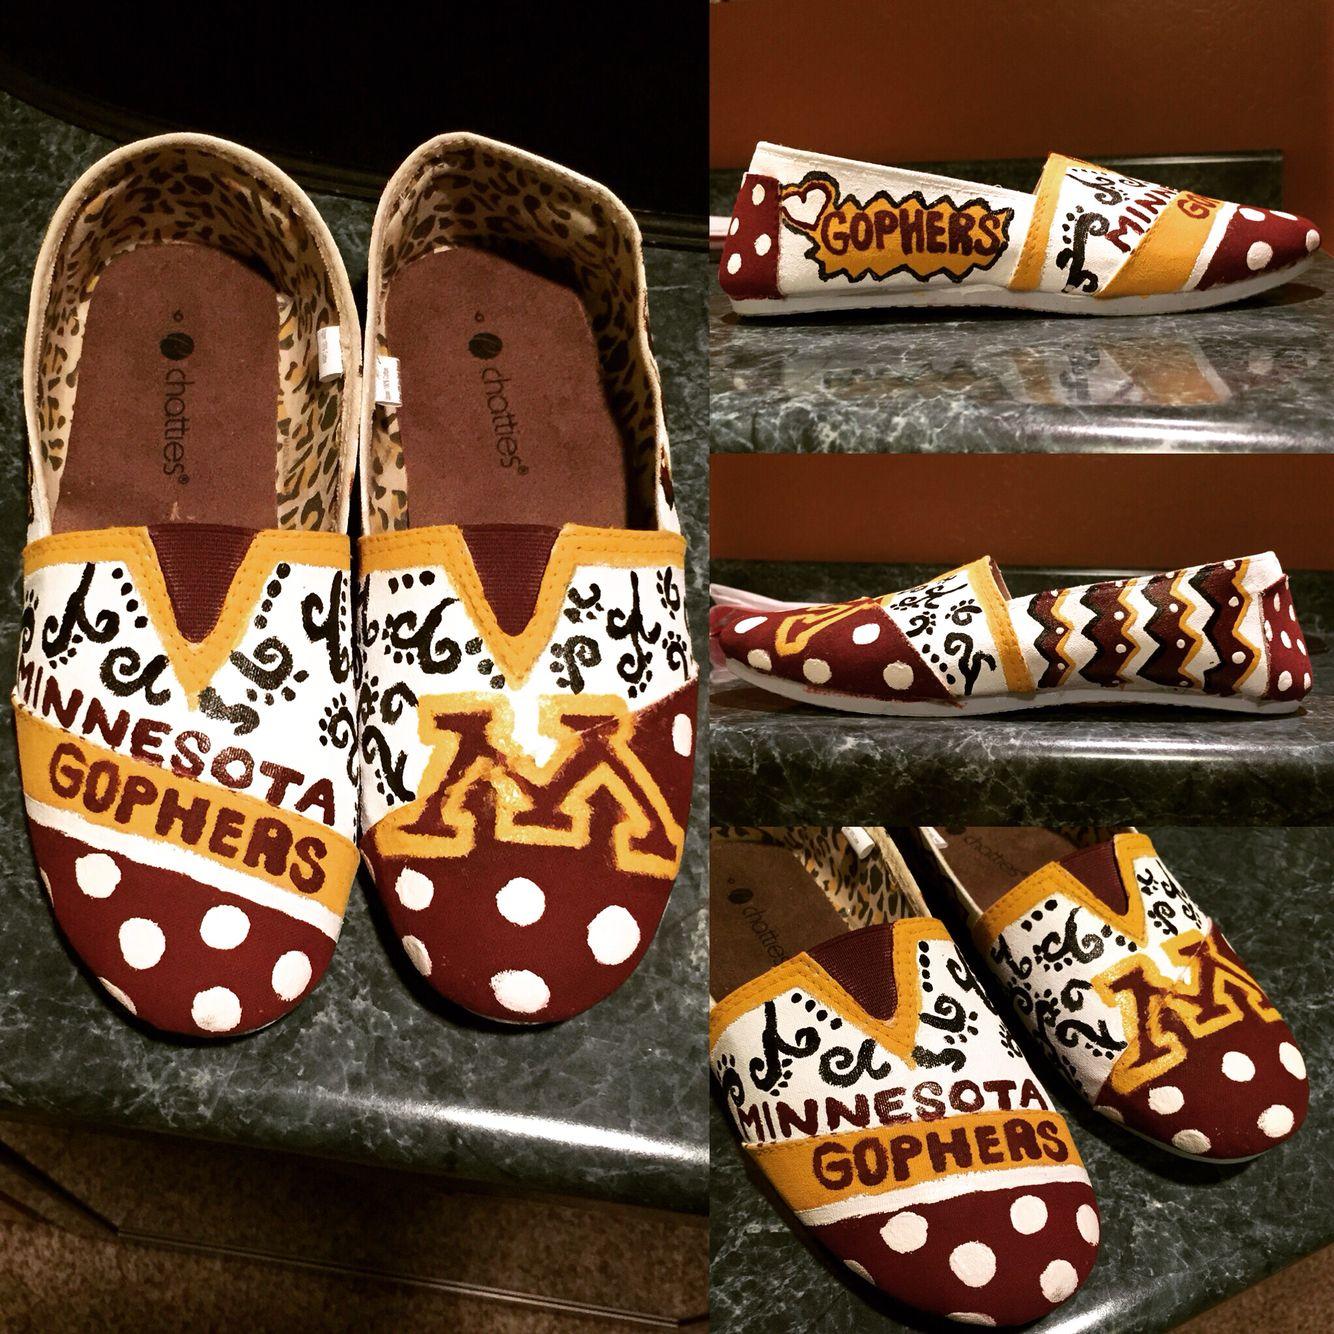 Minnesota Gophers Diy Shoes Minnesota Gophers Diy Shoes Minnesota